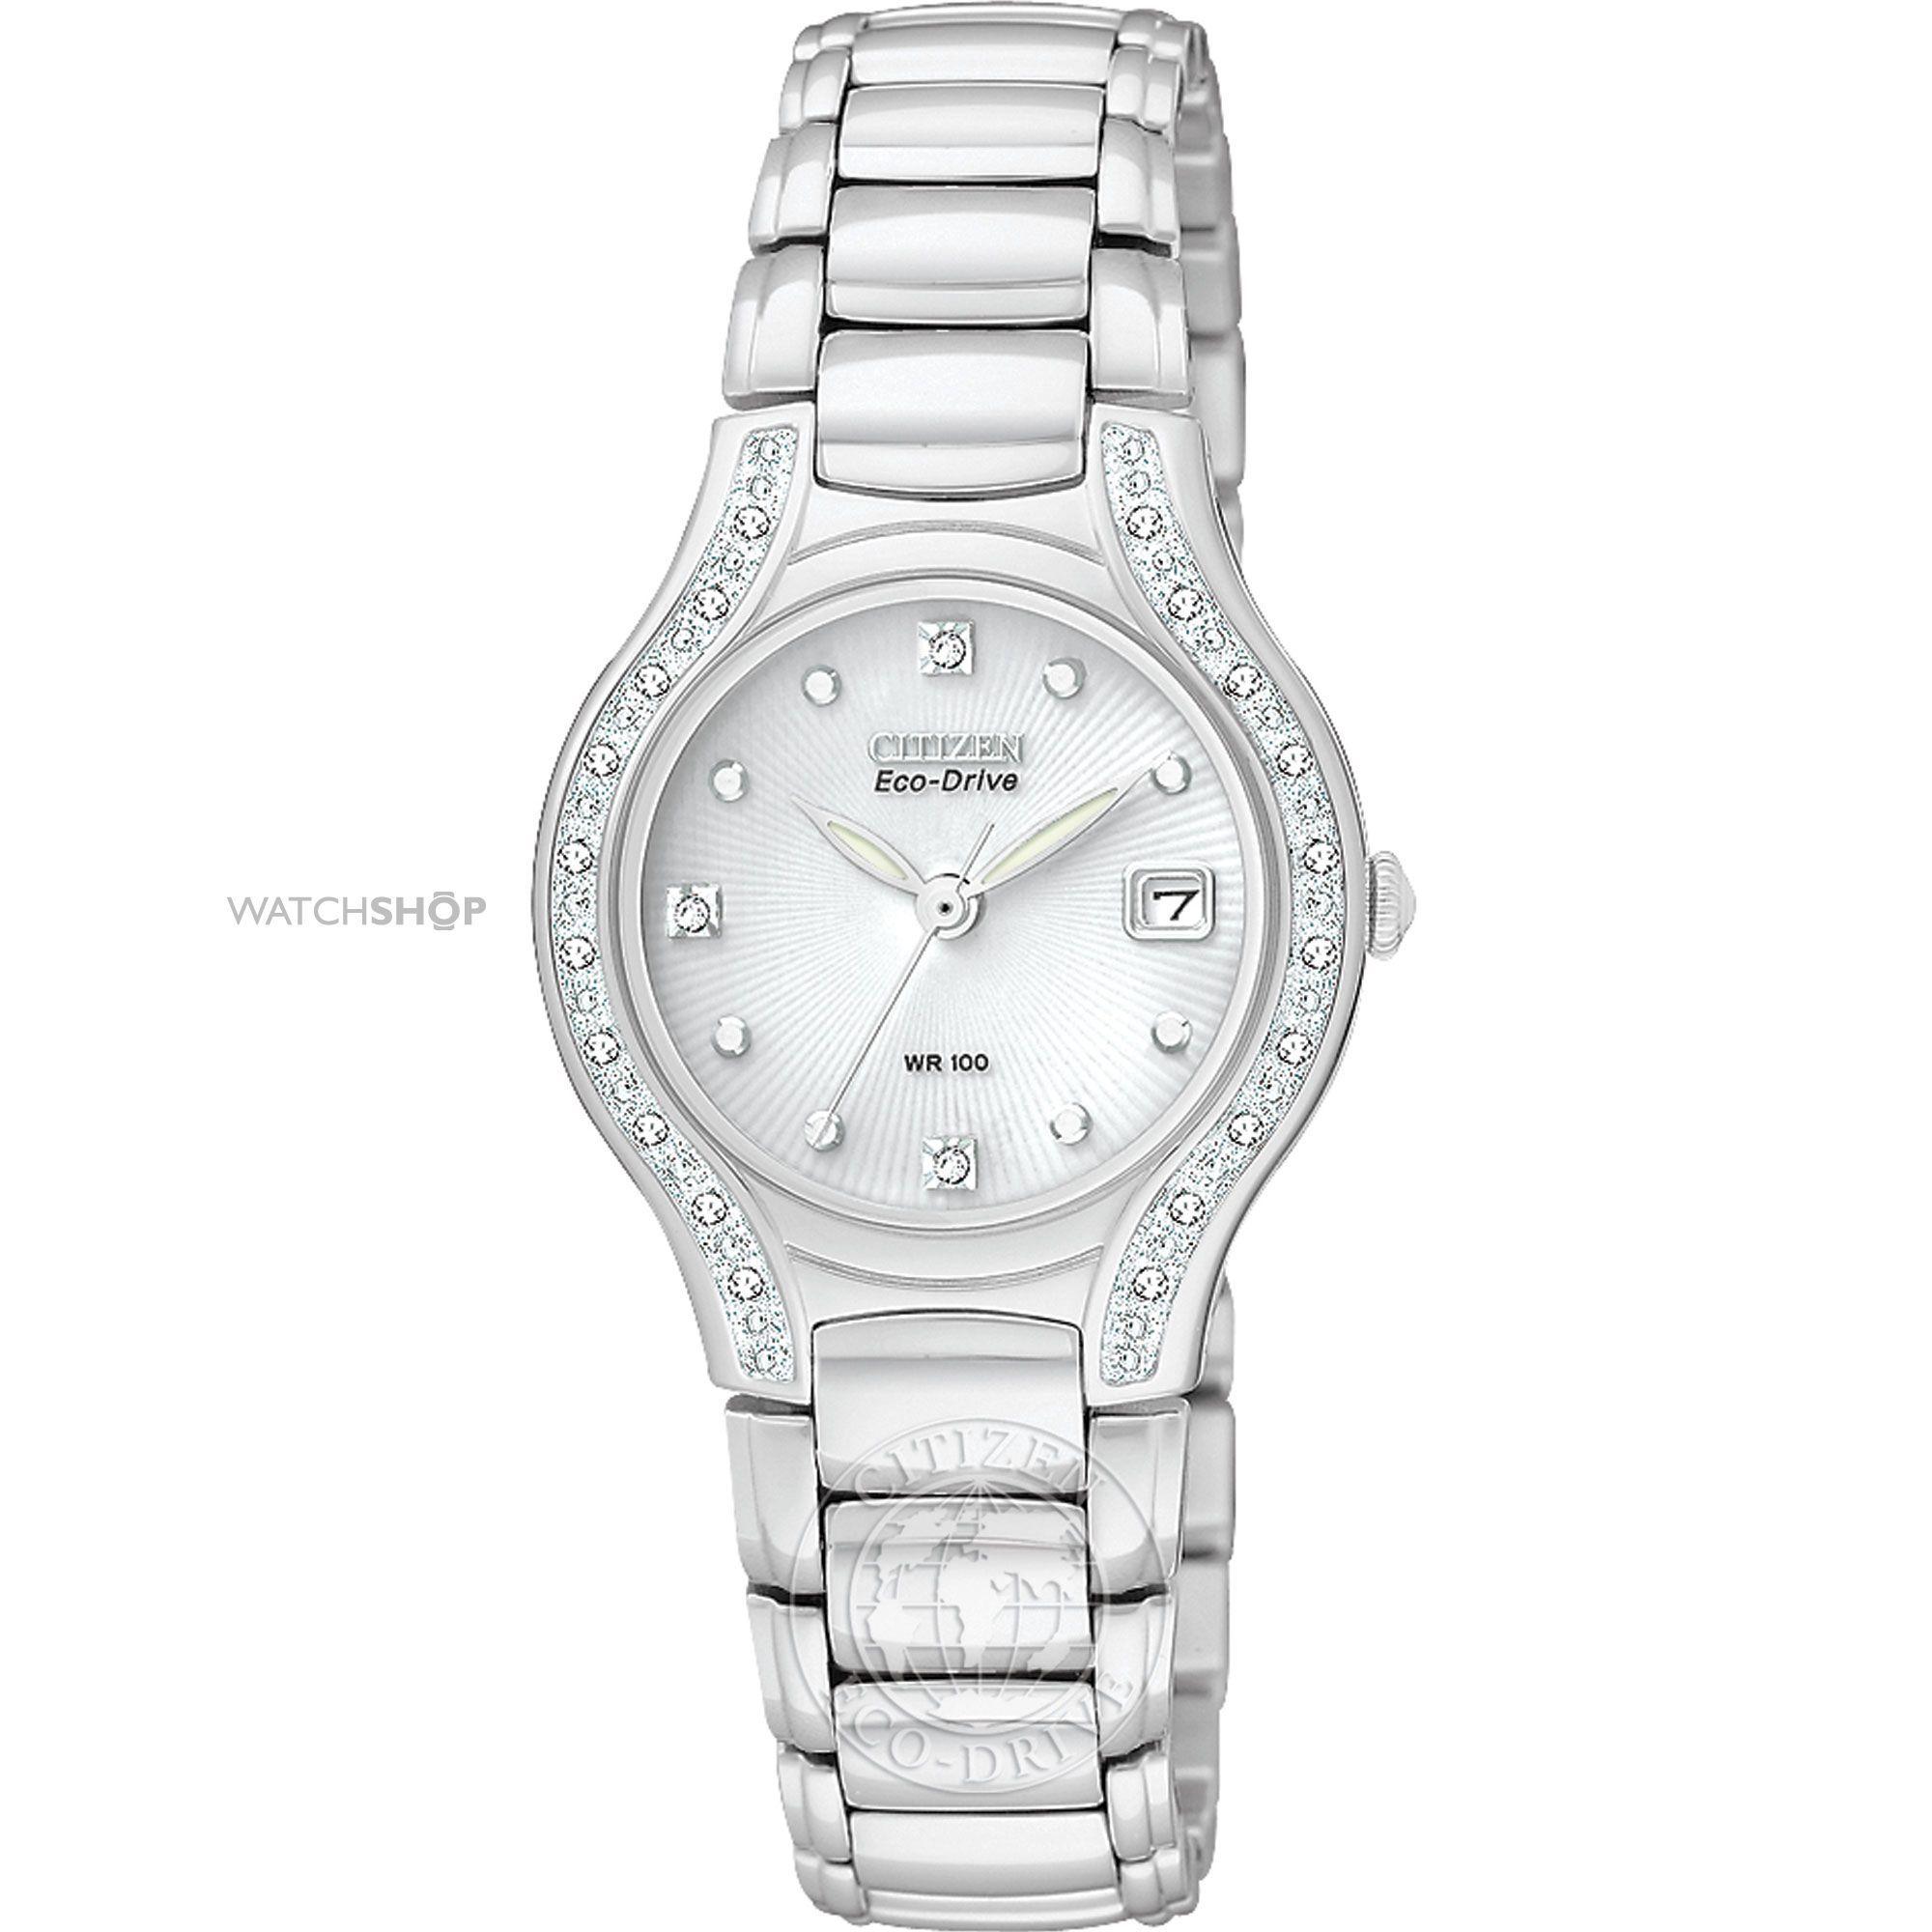 6d413bfea869fd Ladies Citizen Modena Diamond Eco-Drive Watch EW0970-51B